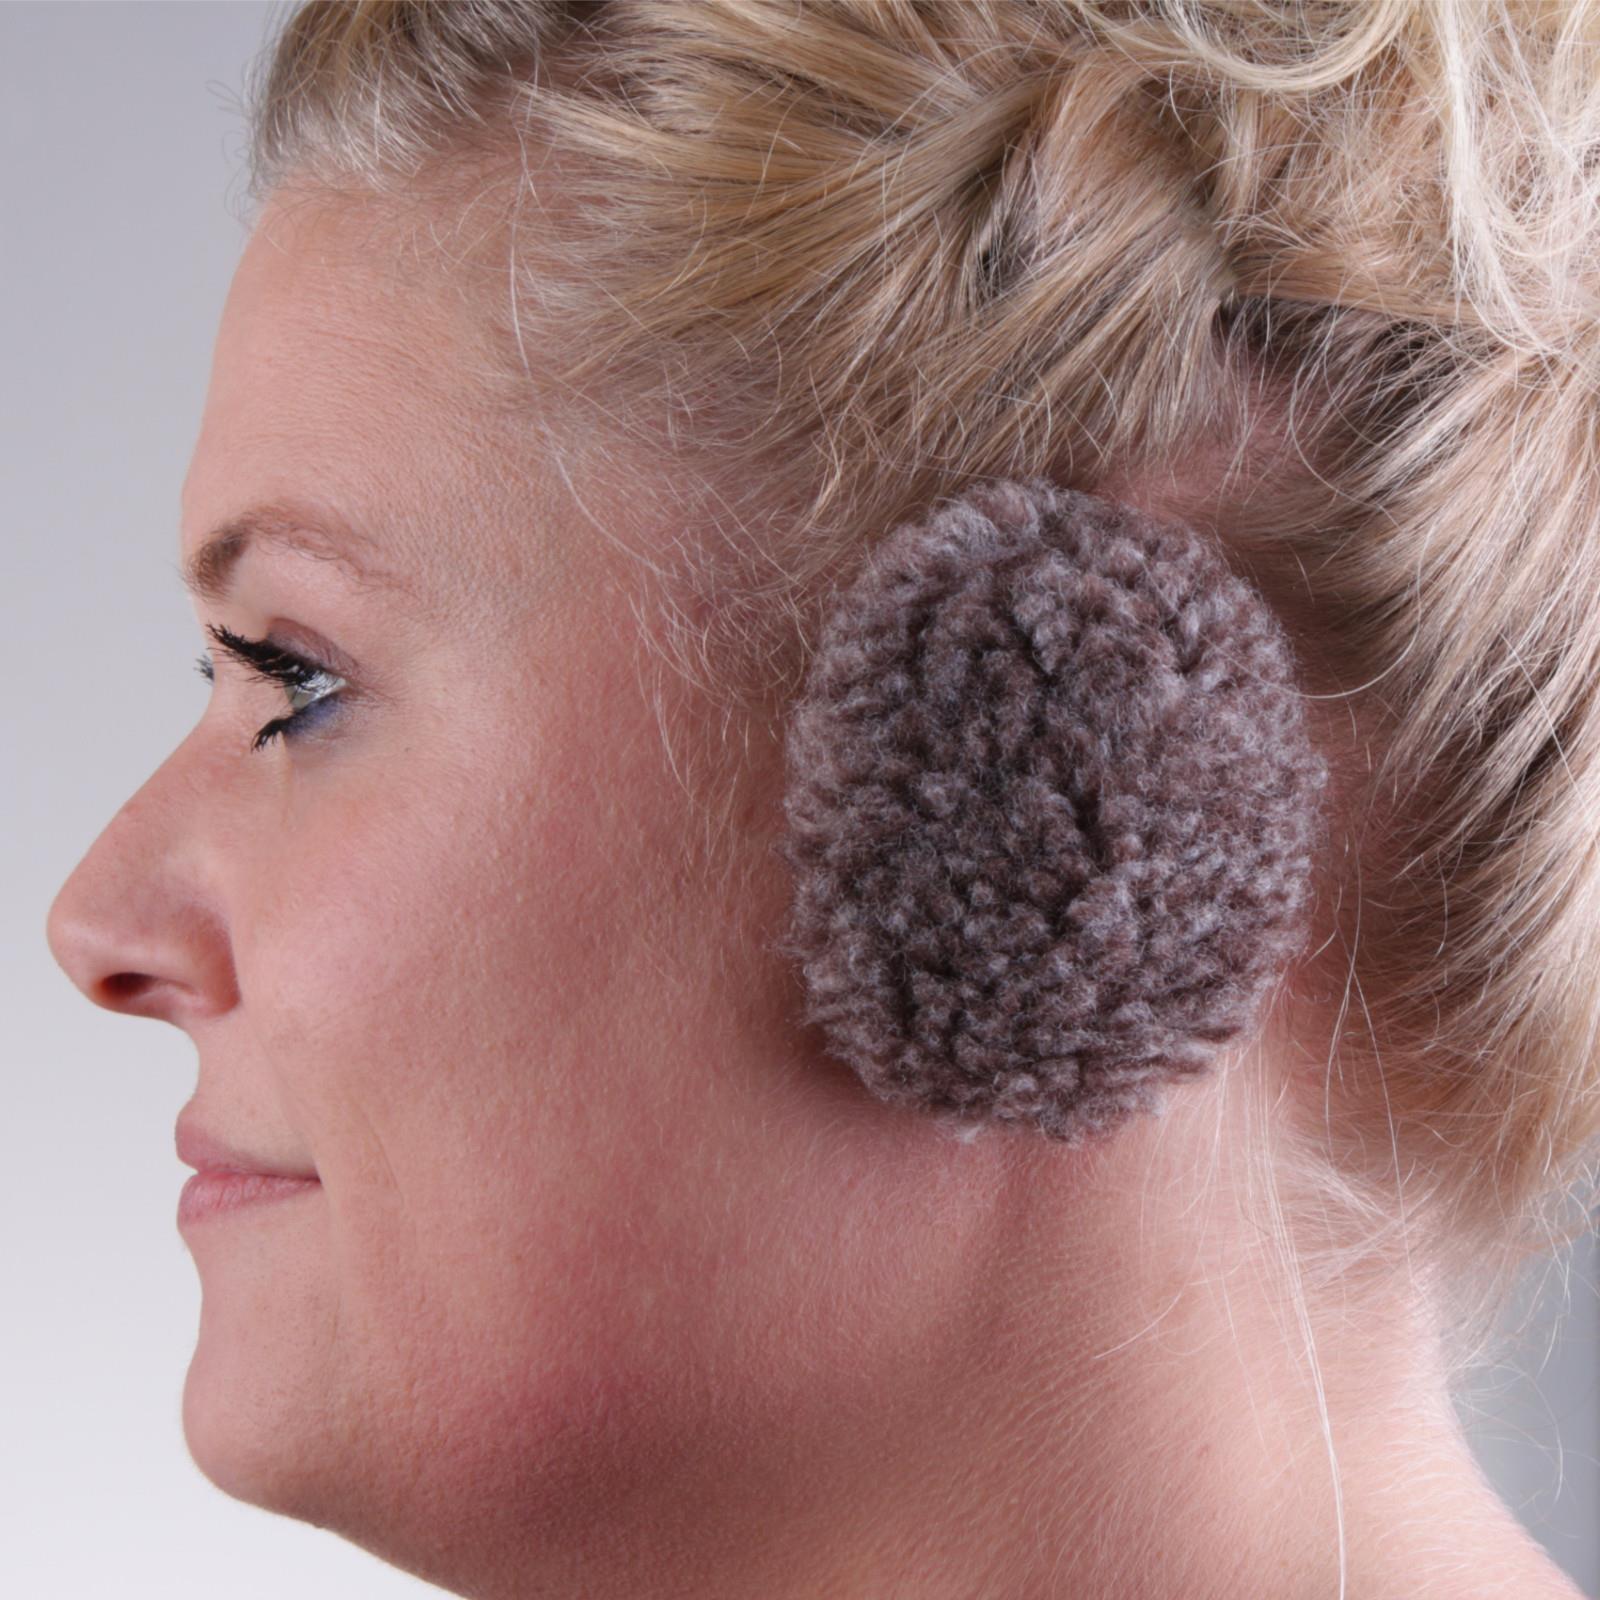 earbags fleece lammfell imitat ohrensch tzer ohrenw rmer m tze stirnband earbag ebay. Black Bedroom Furniture Sets. Home Design Ideas